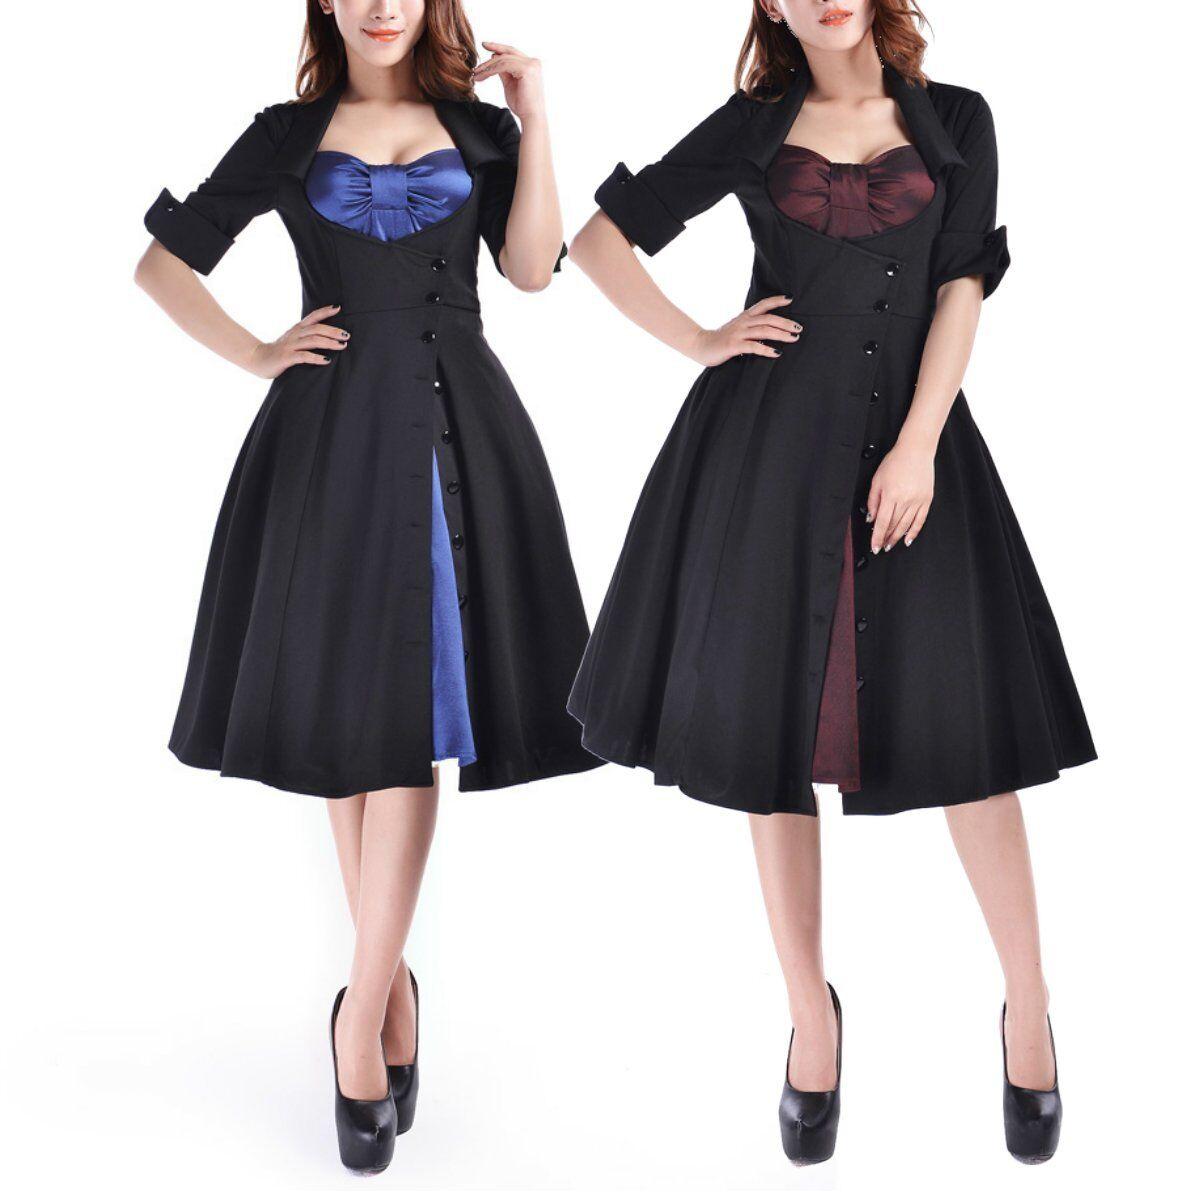 CSTD 51111 Damen Kleid Rockabilly 50er 60er Vintage Dress Burgund   Blau 36-58